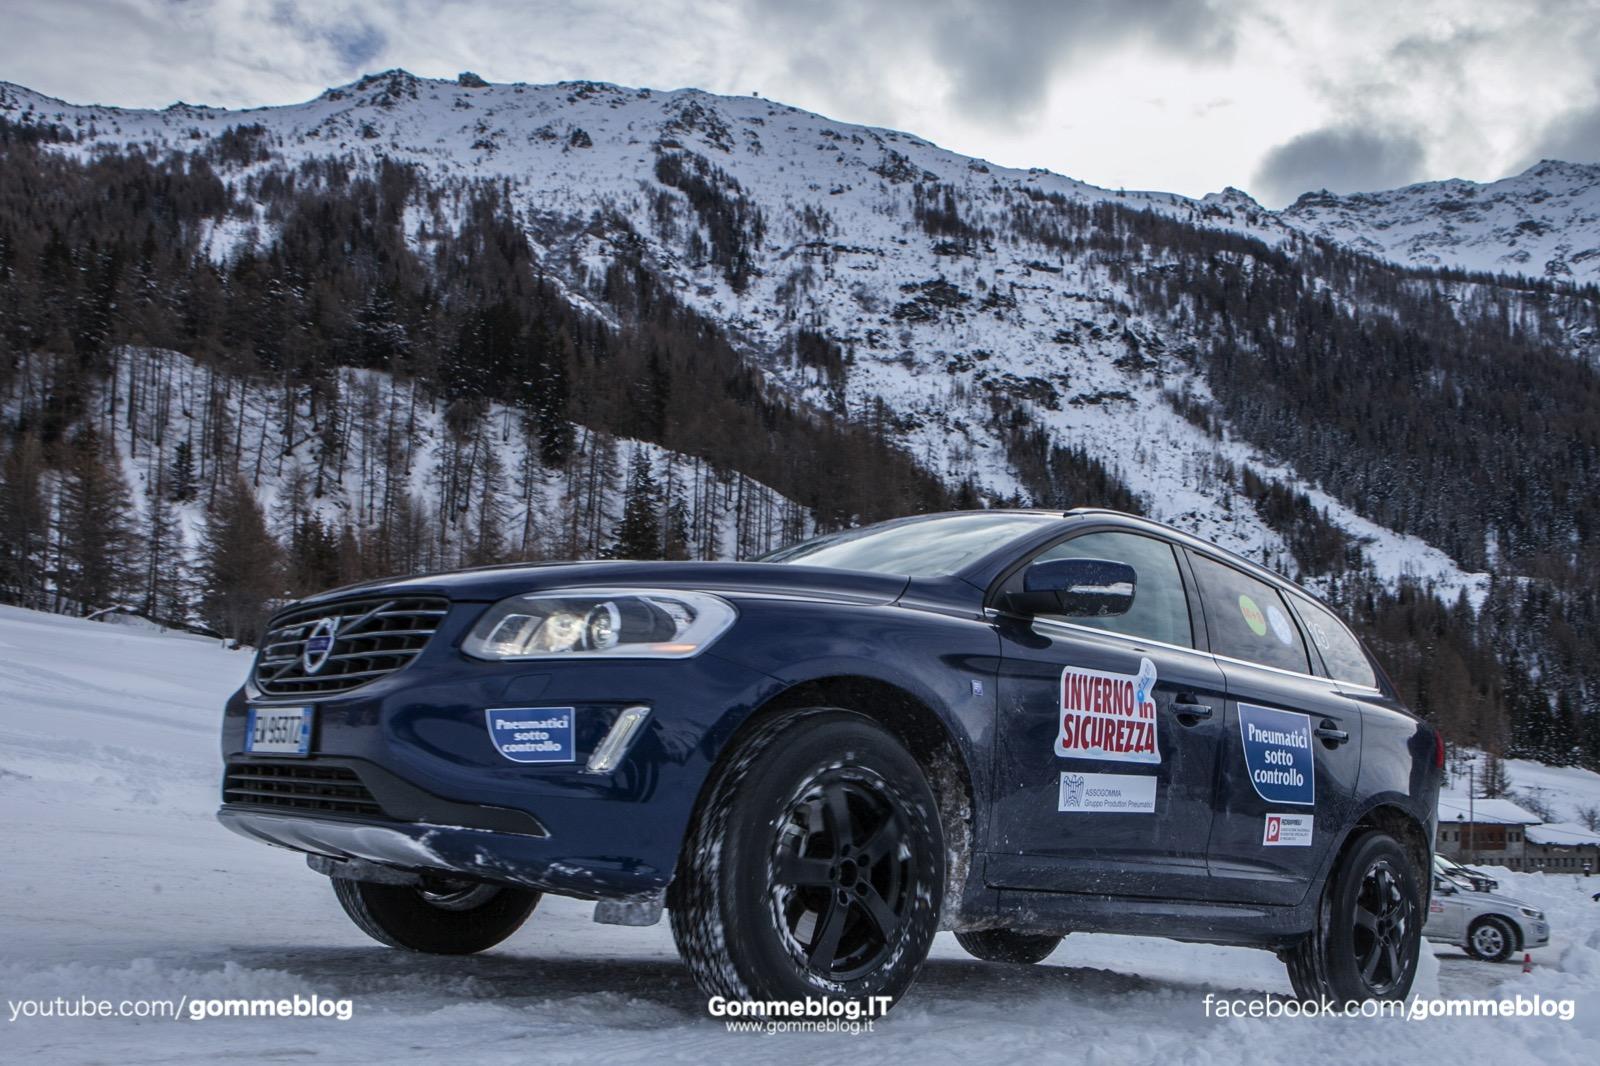 TEST Pneumatici Invernali 2015: a La Thuile con Assogomma e Federpneus 2